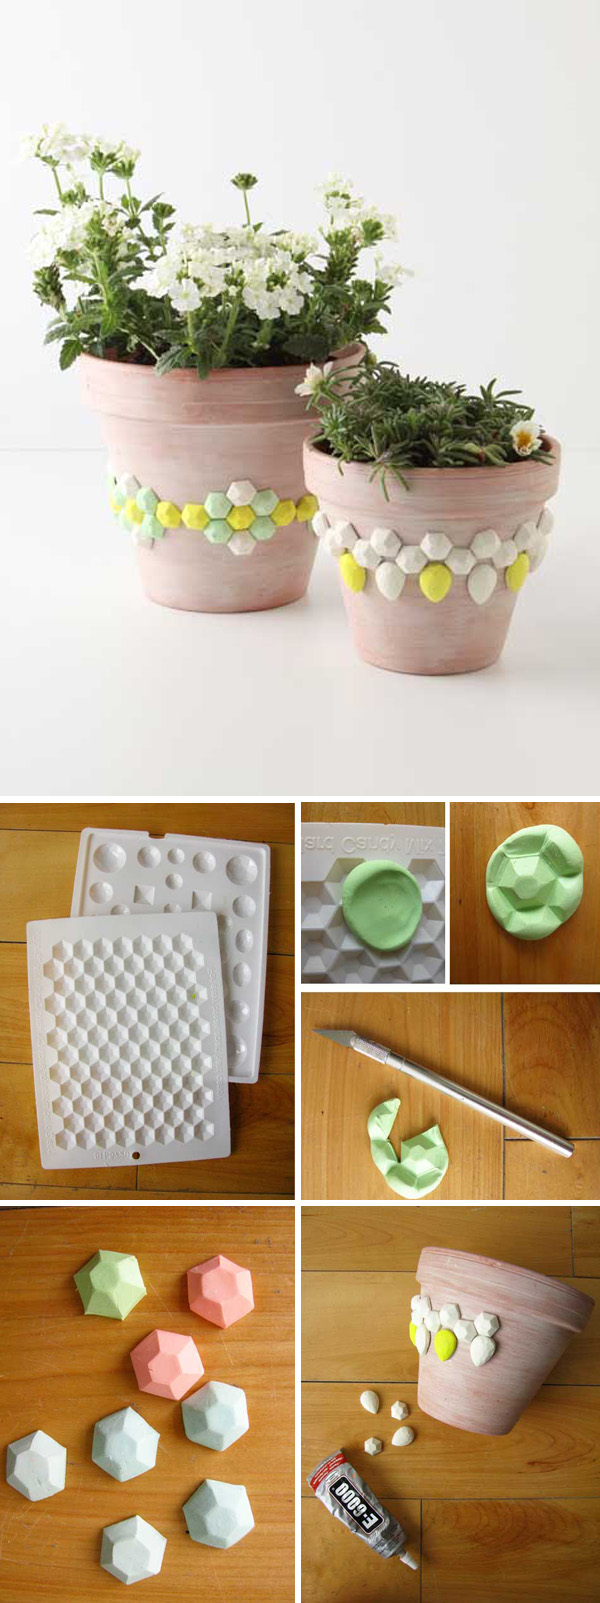 DIY ιδέες με γλάστρες30